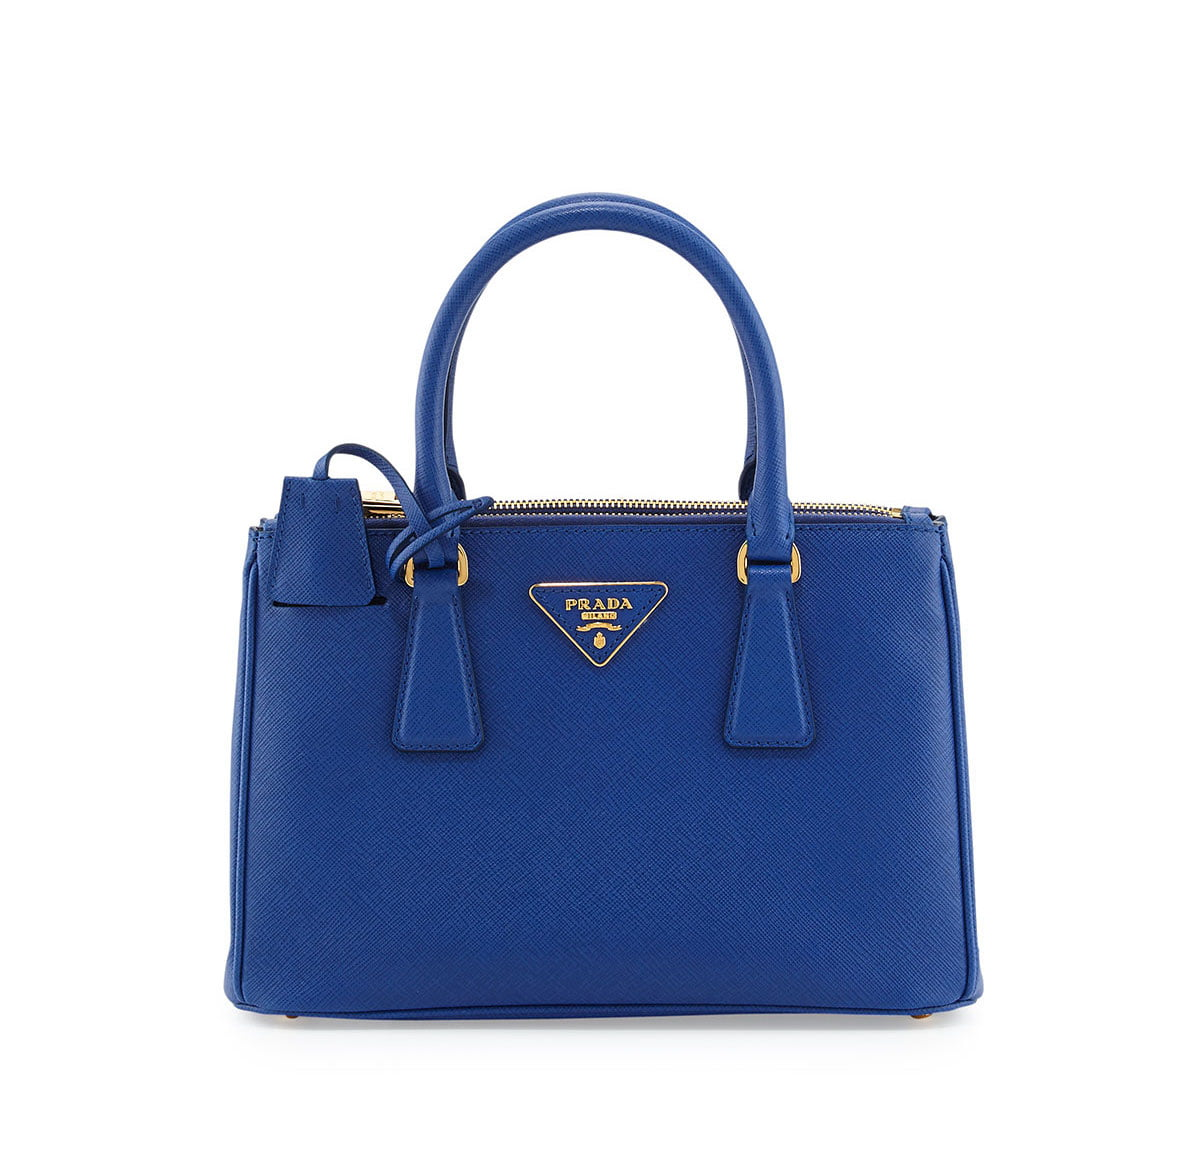 Prada-Blue-Saffiano-Double-Zip-Mini-Crossbody-Bag